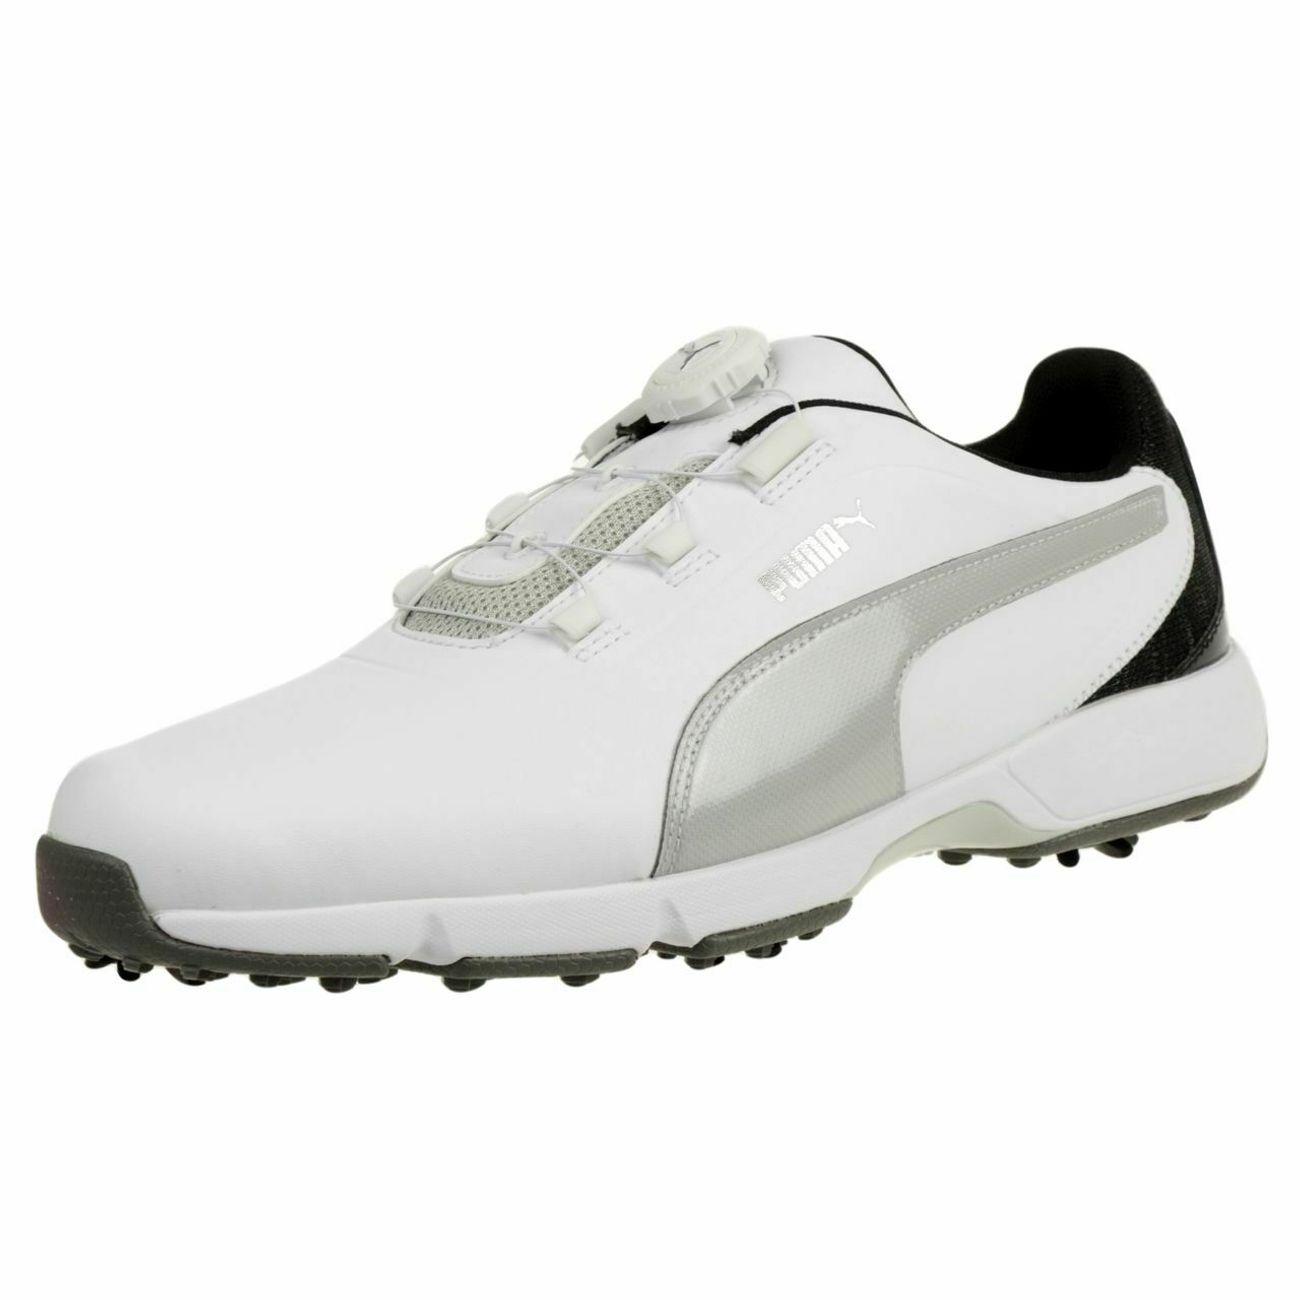 Golf homme PUMA Chaussures Puma Ignite Drive Disc